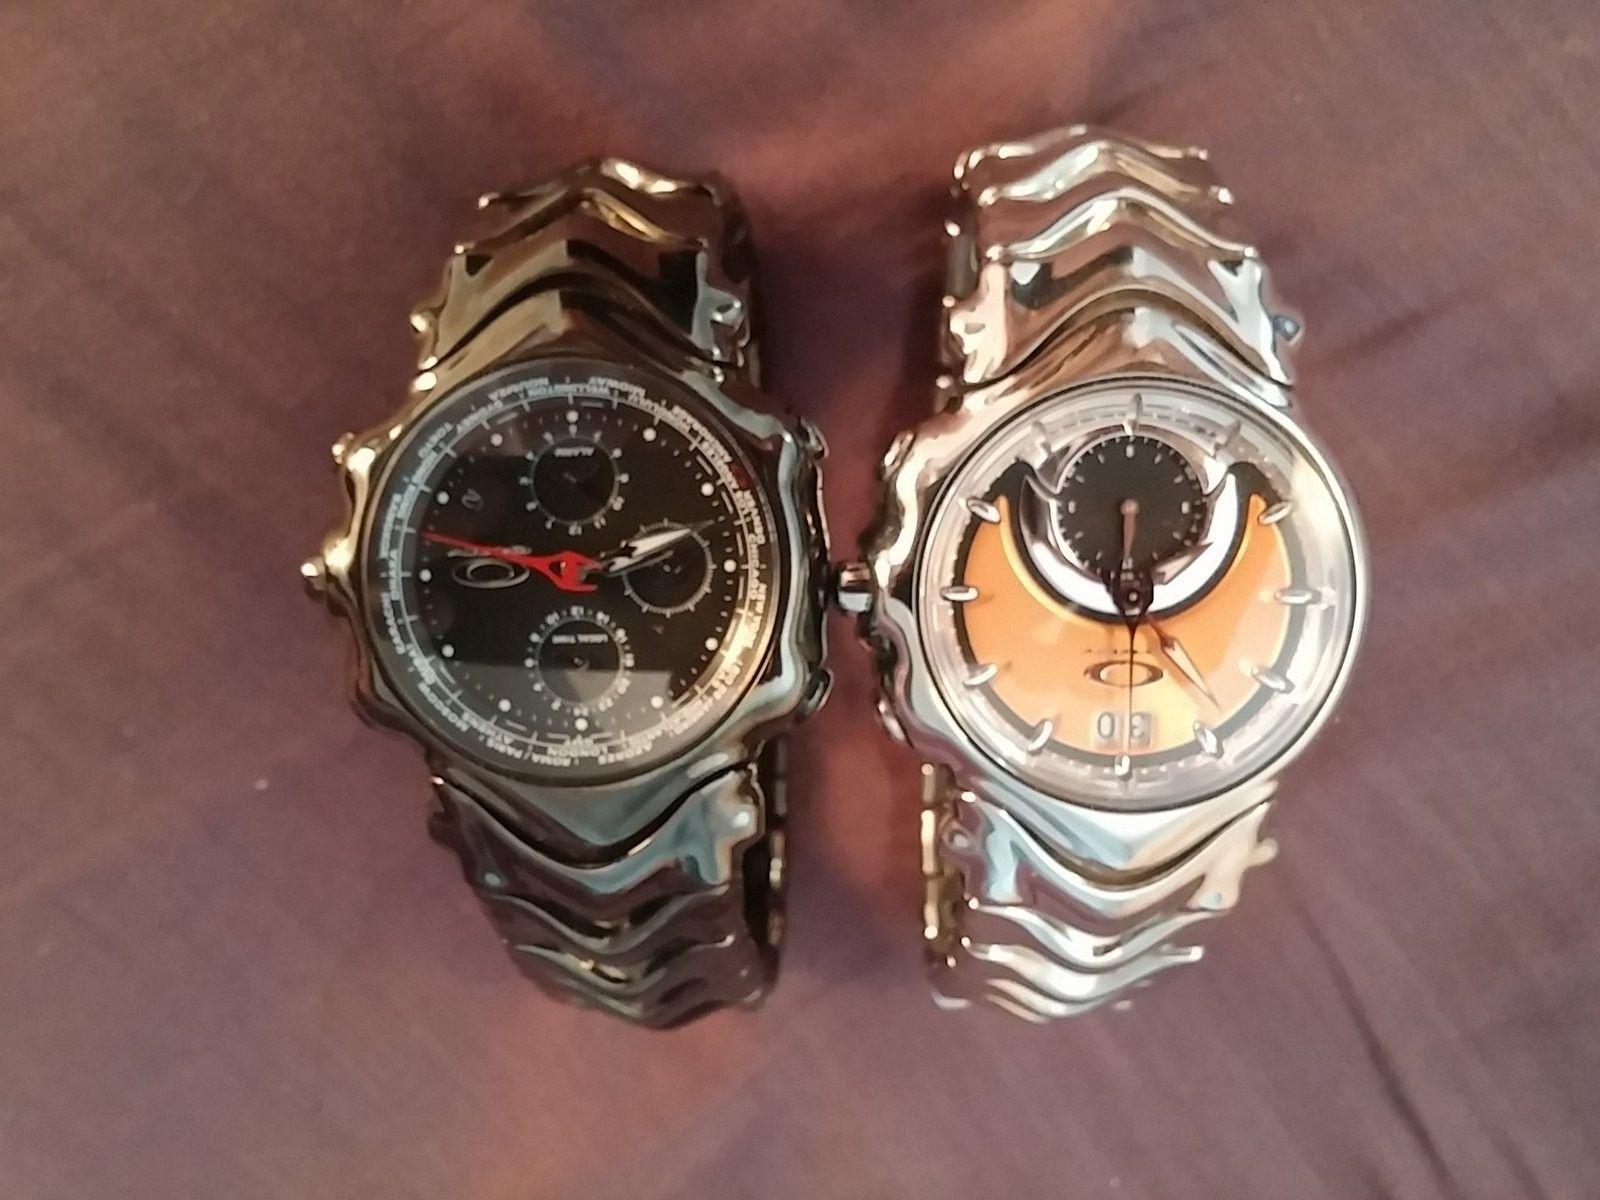 Watch Sale - MORE ADDED & Price Drop - Minute Machine, Gearbox, Blade, Judge, GMT - 20150221_115450.jpg